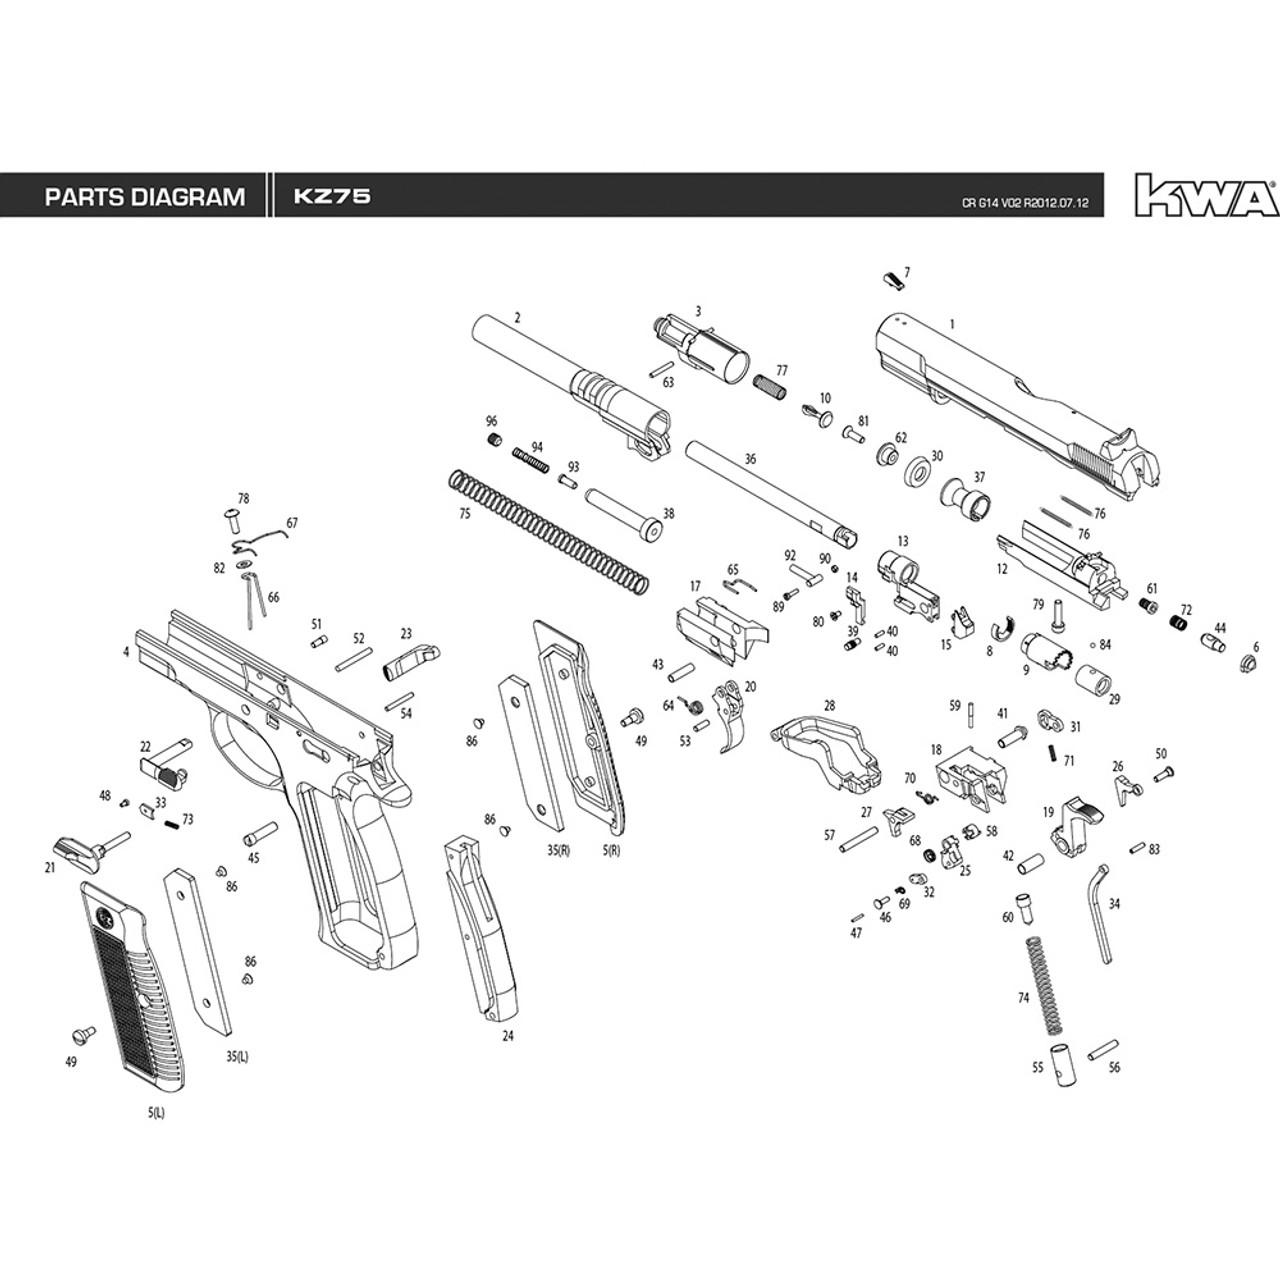 kwa airsoft kz75 pistol diagram [ 1280 x 1280 Pixel ]